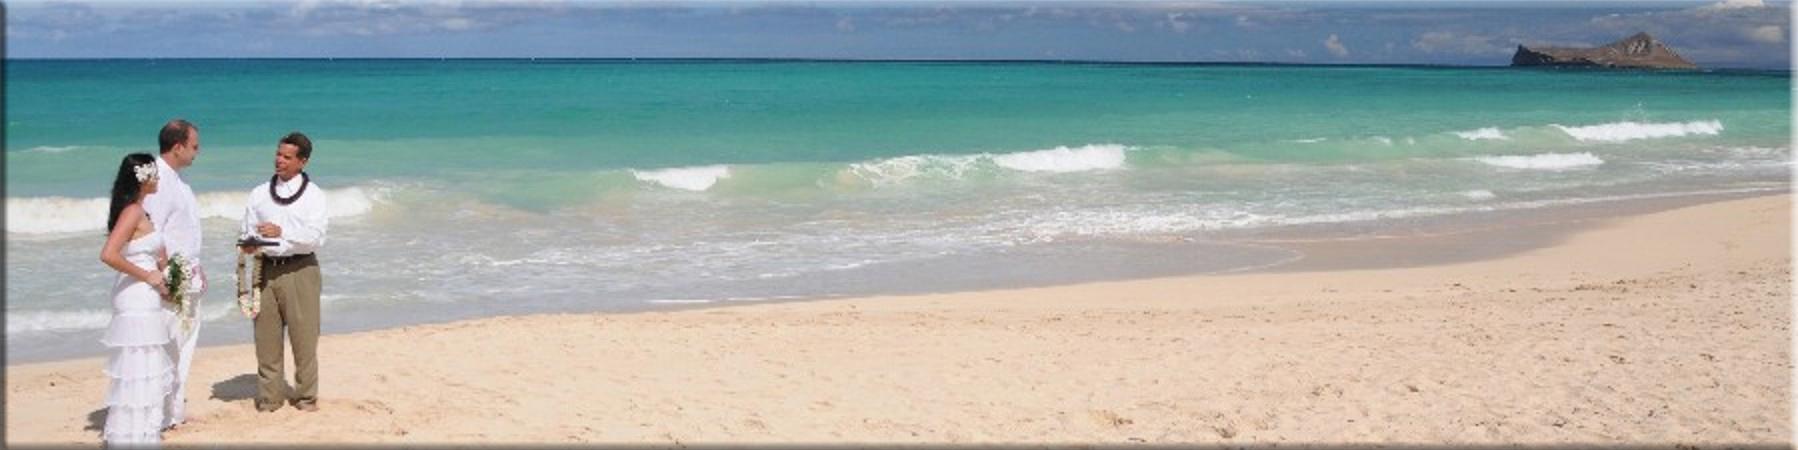 Waimanalo Beach Weddings - by Bridal Dream Hawaii